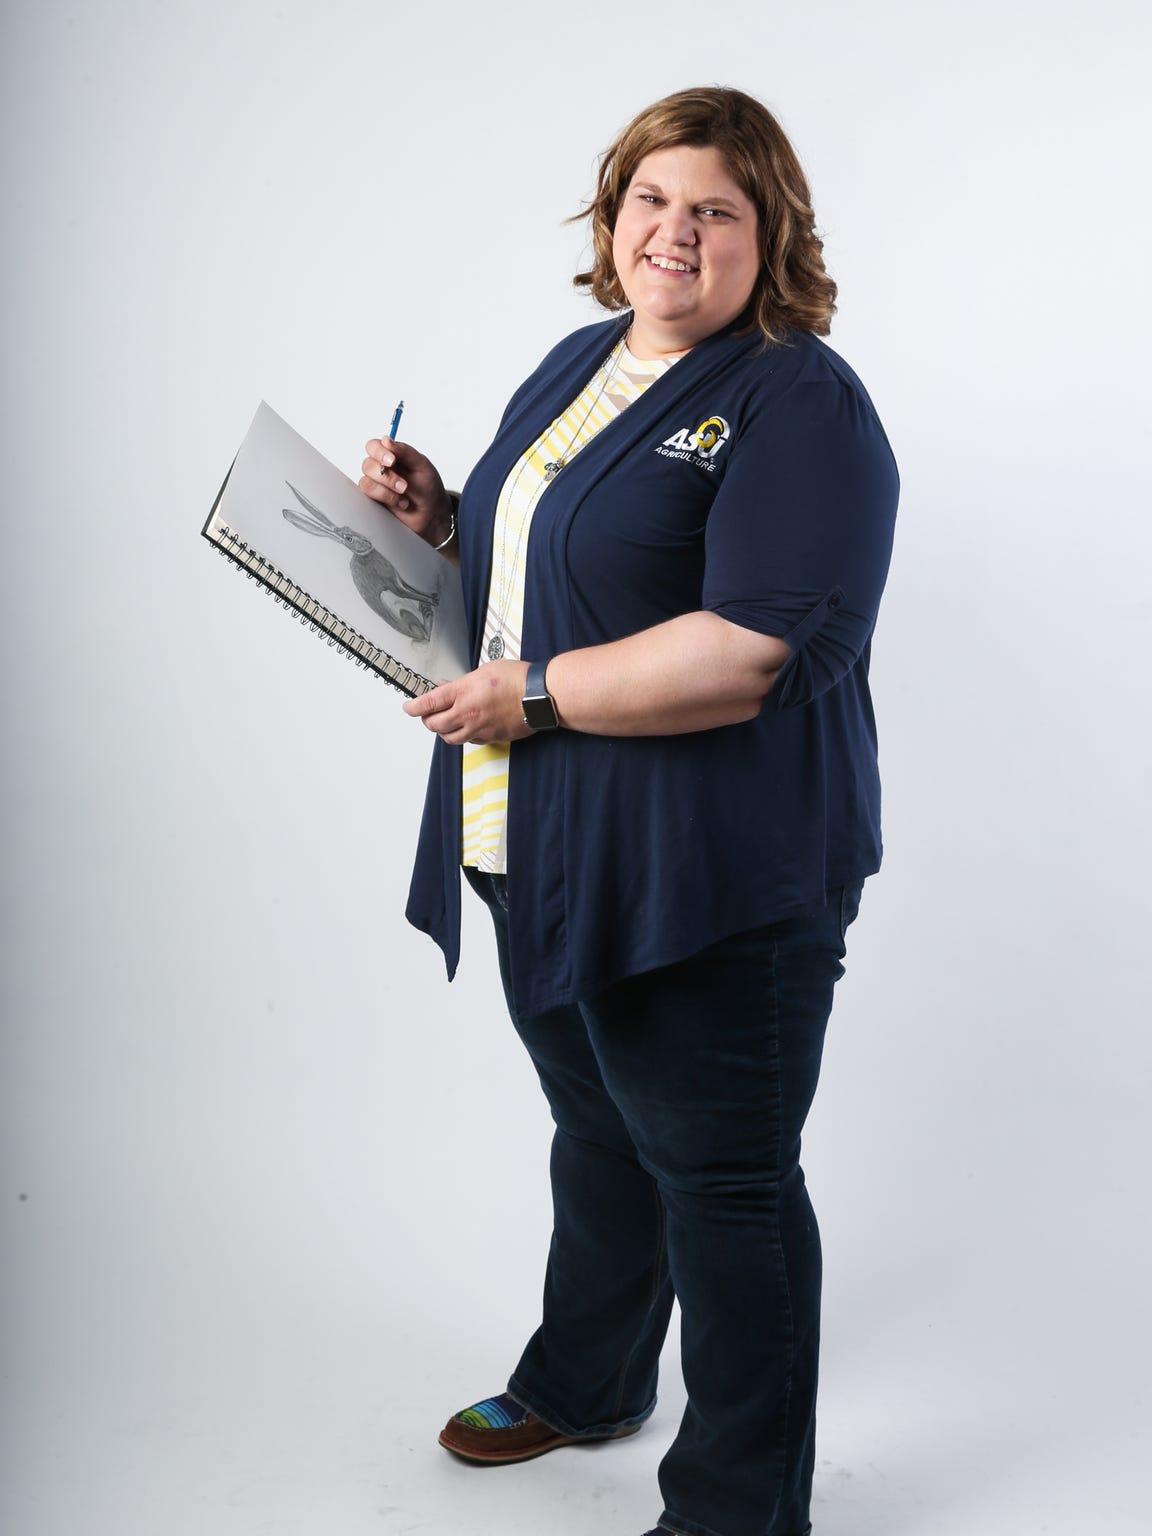 Loree Branham, Associate Professor of Animal Science